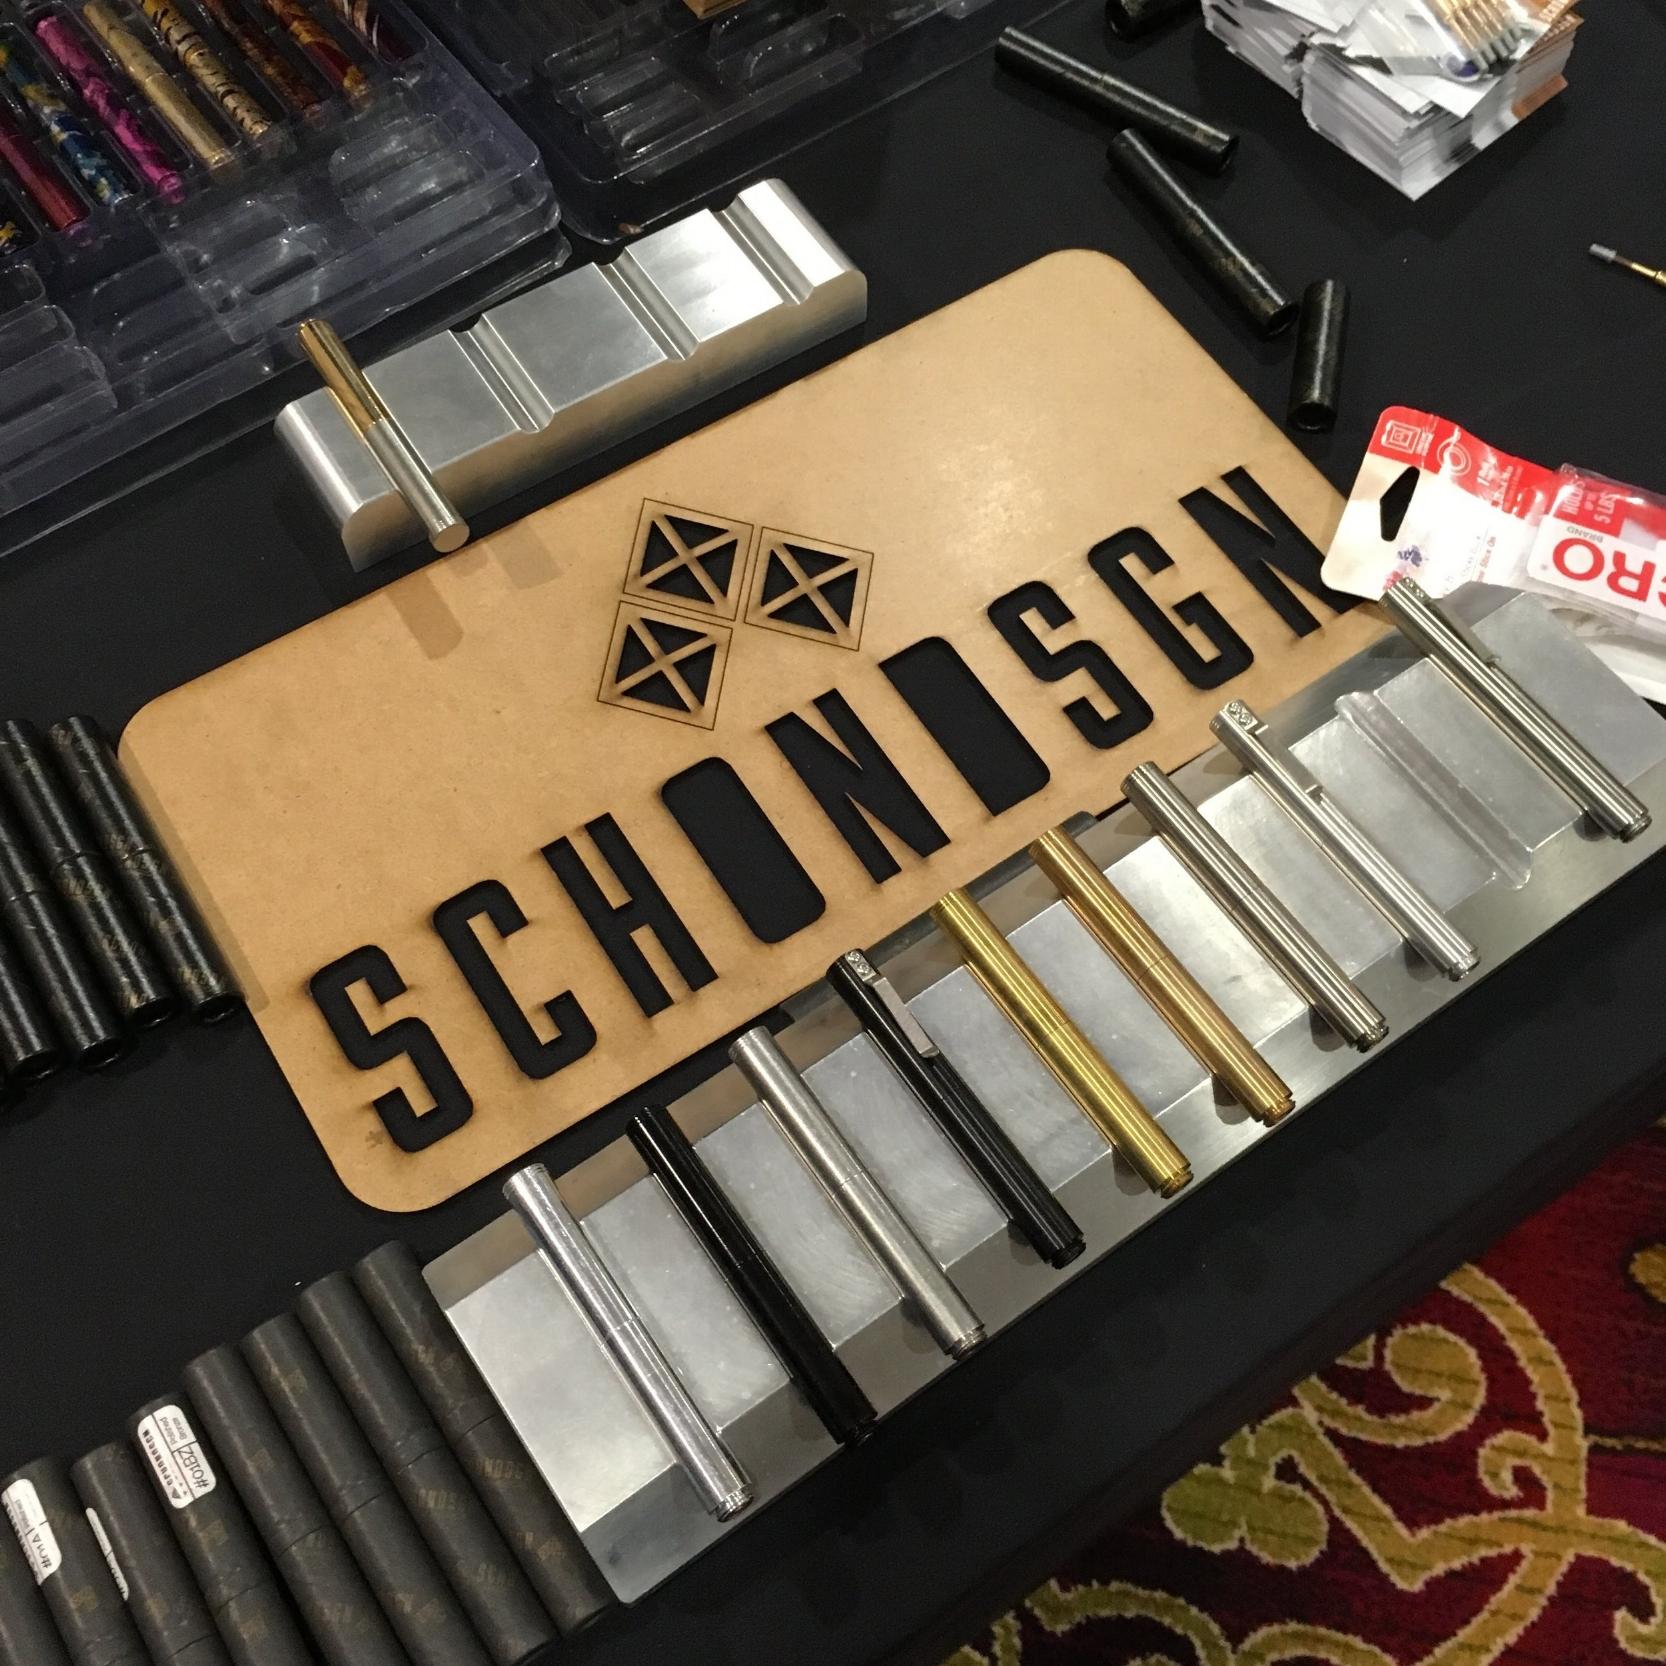 Schon-dsgn-Pocket-Pens